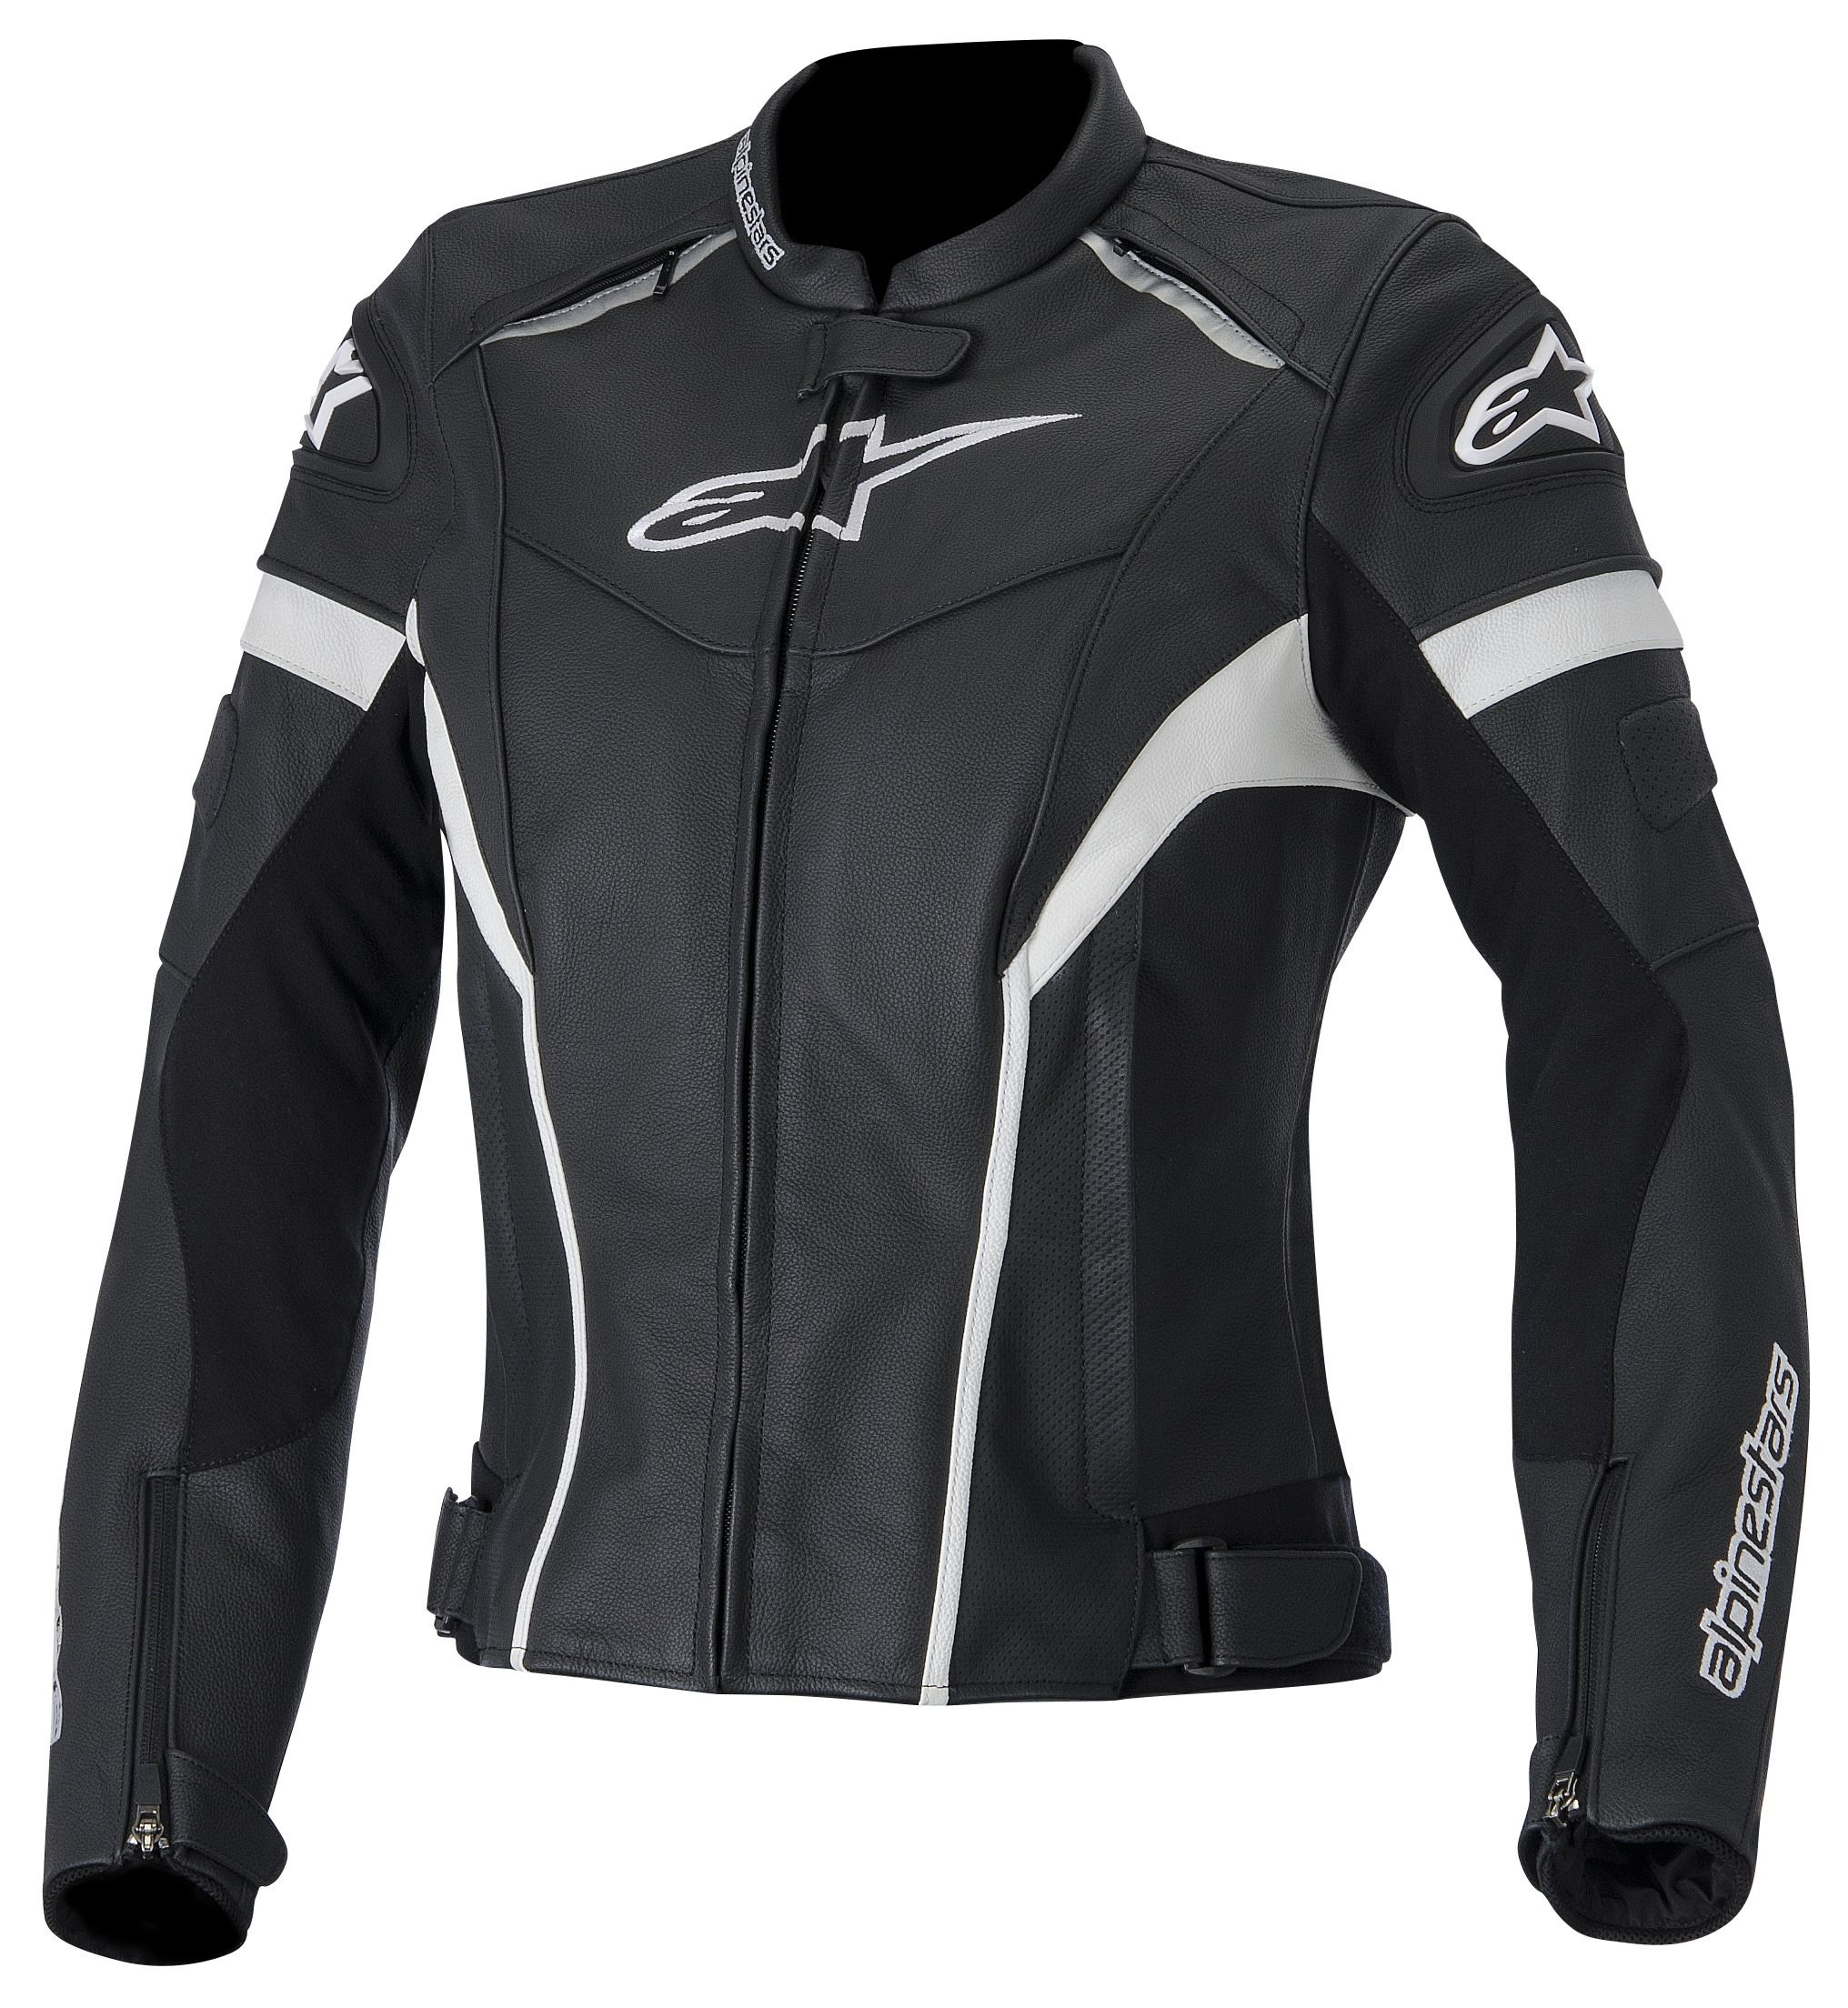 Damen Lederjacke Stella GP Plus R V2 Jacket black fuchsia pink, Alpinestars, 40